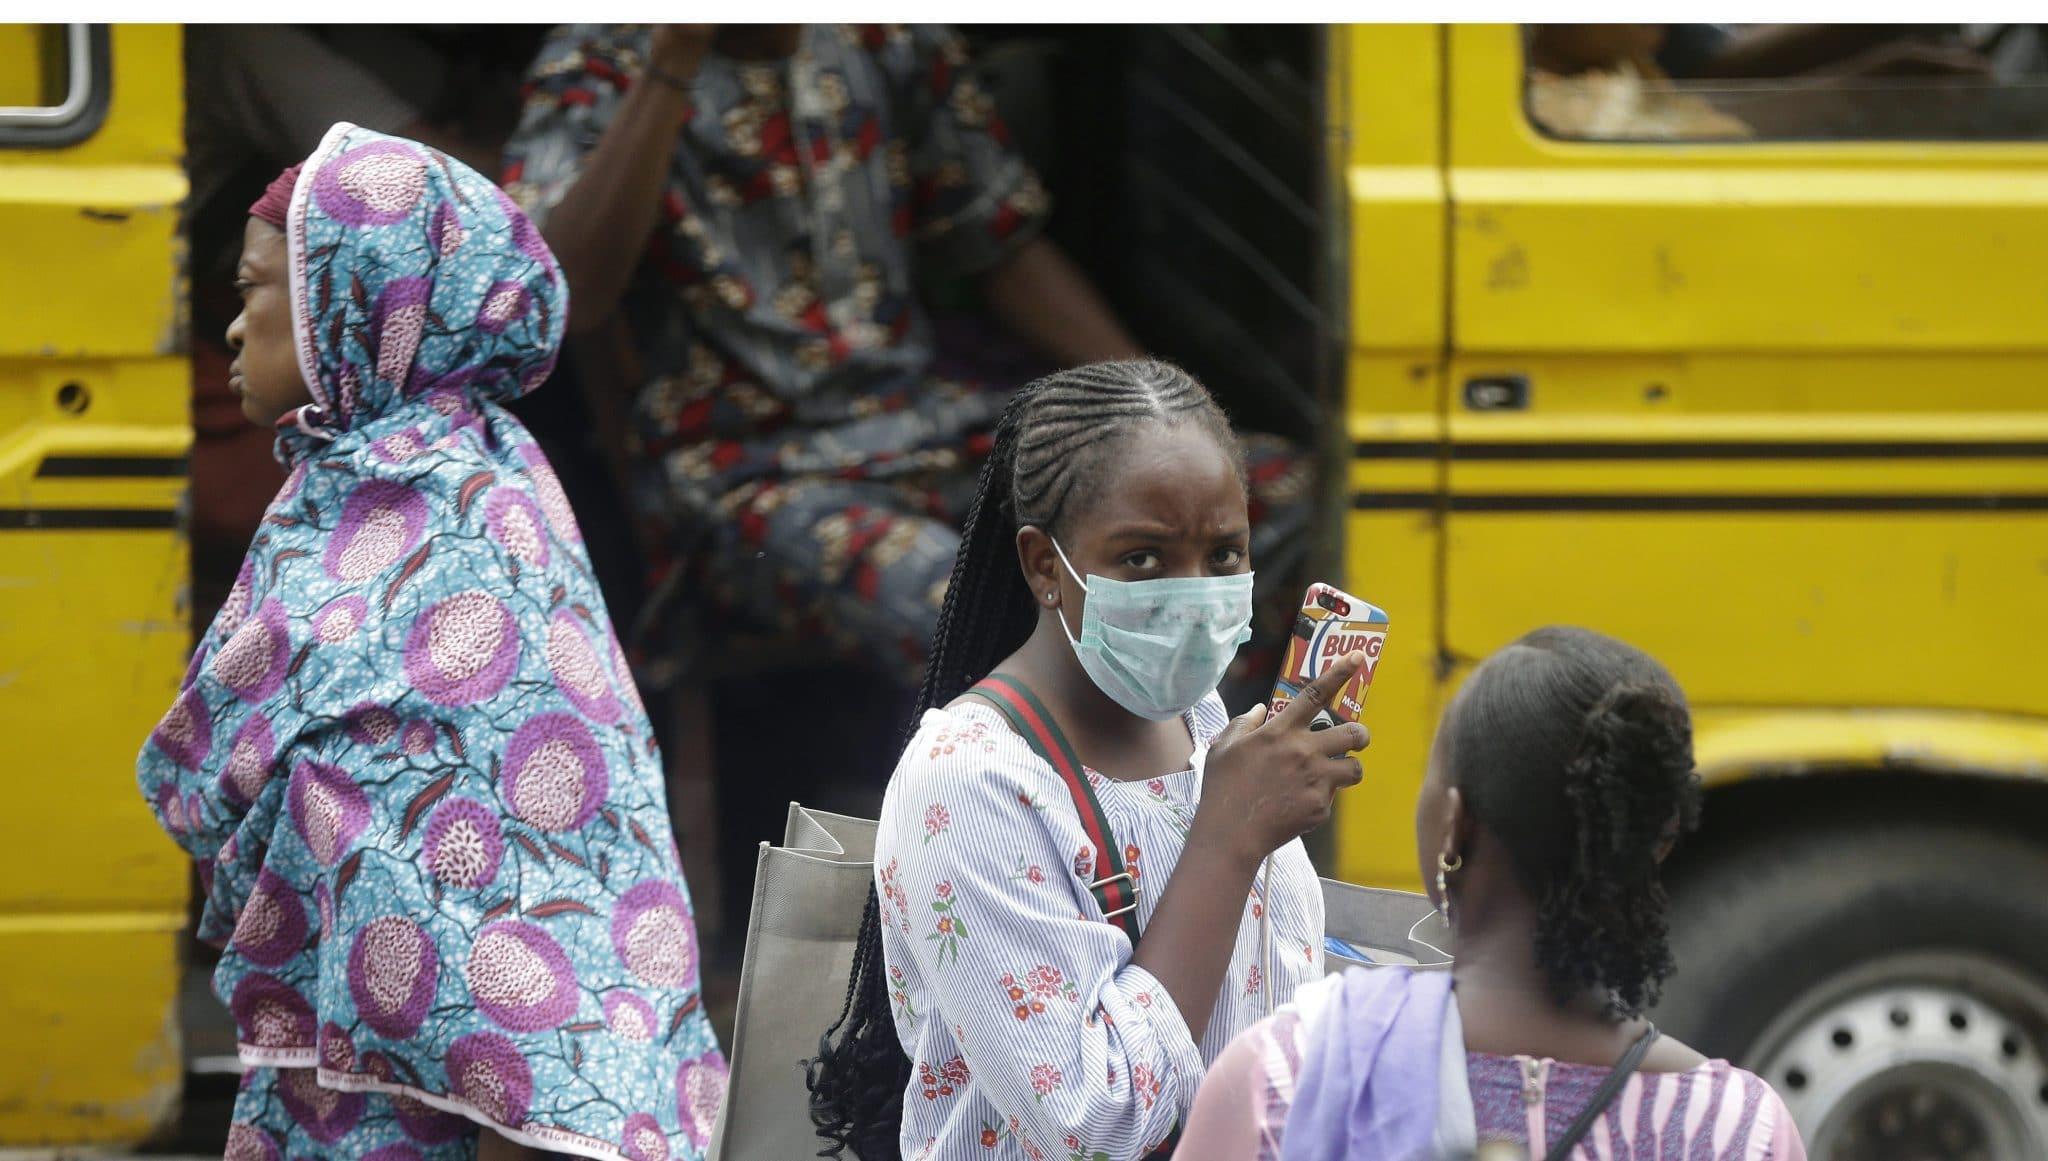 Africa COVID-19 cases surpass 2 million